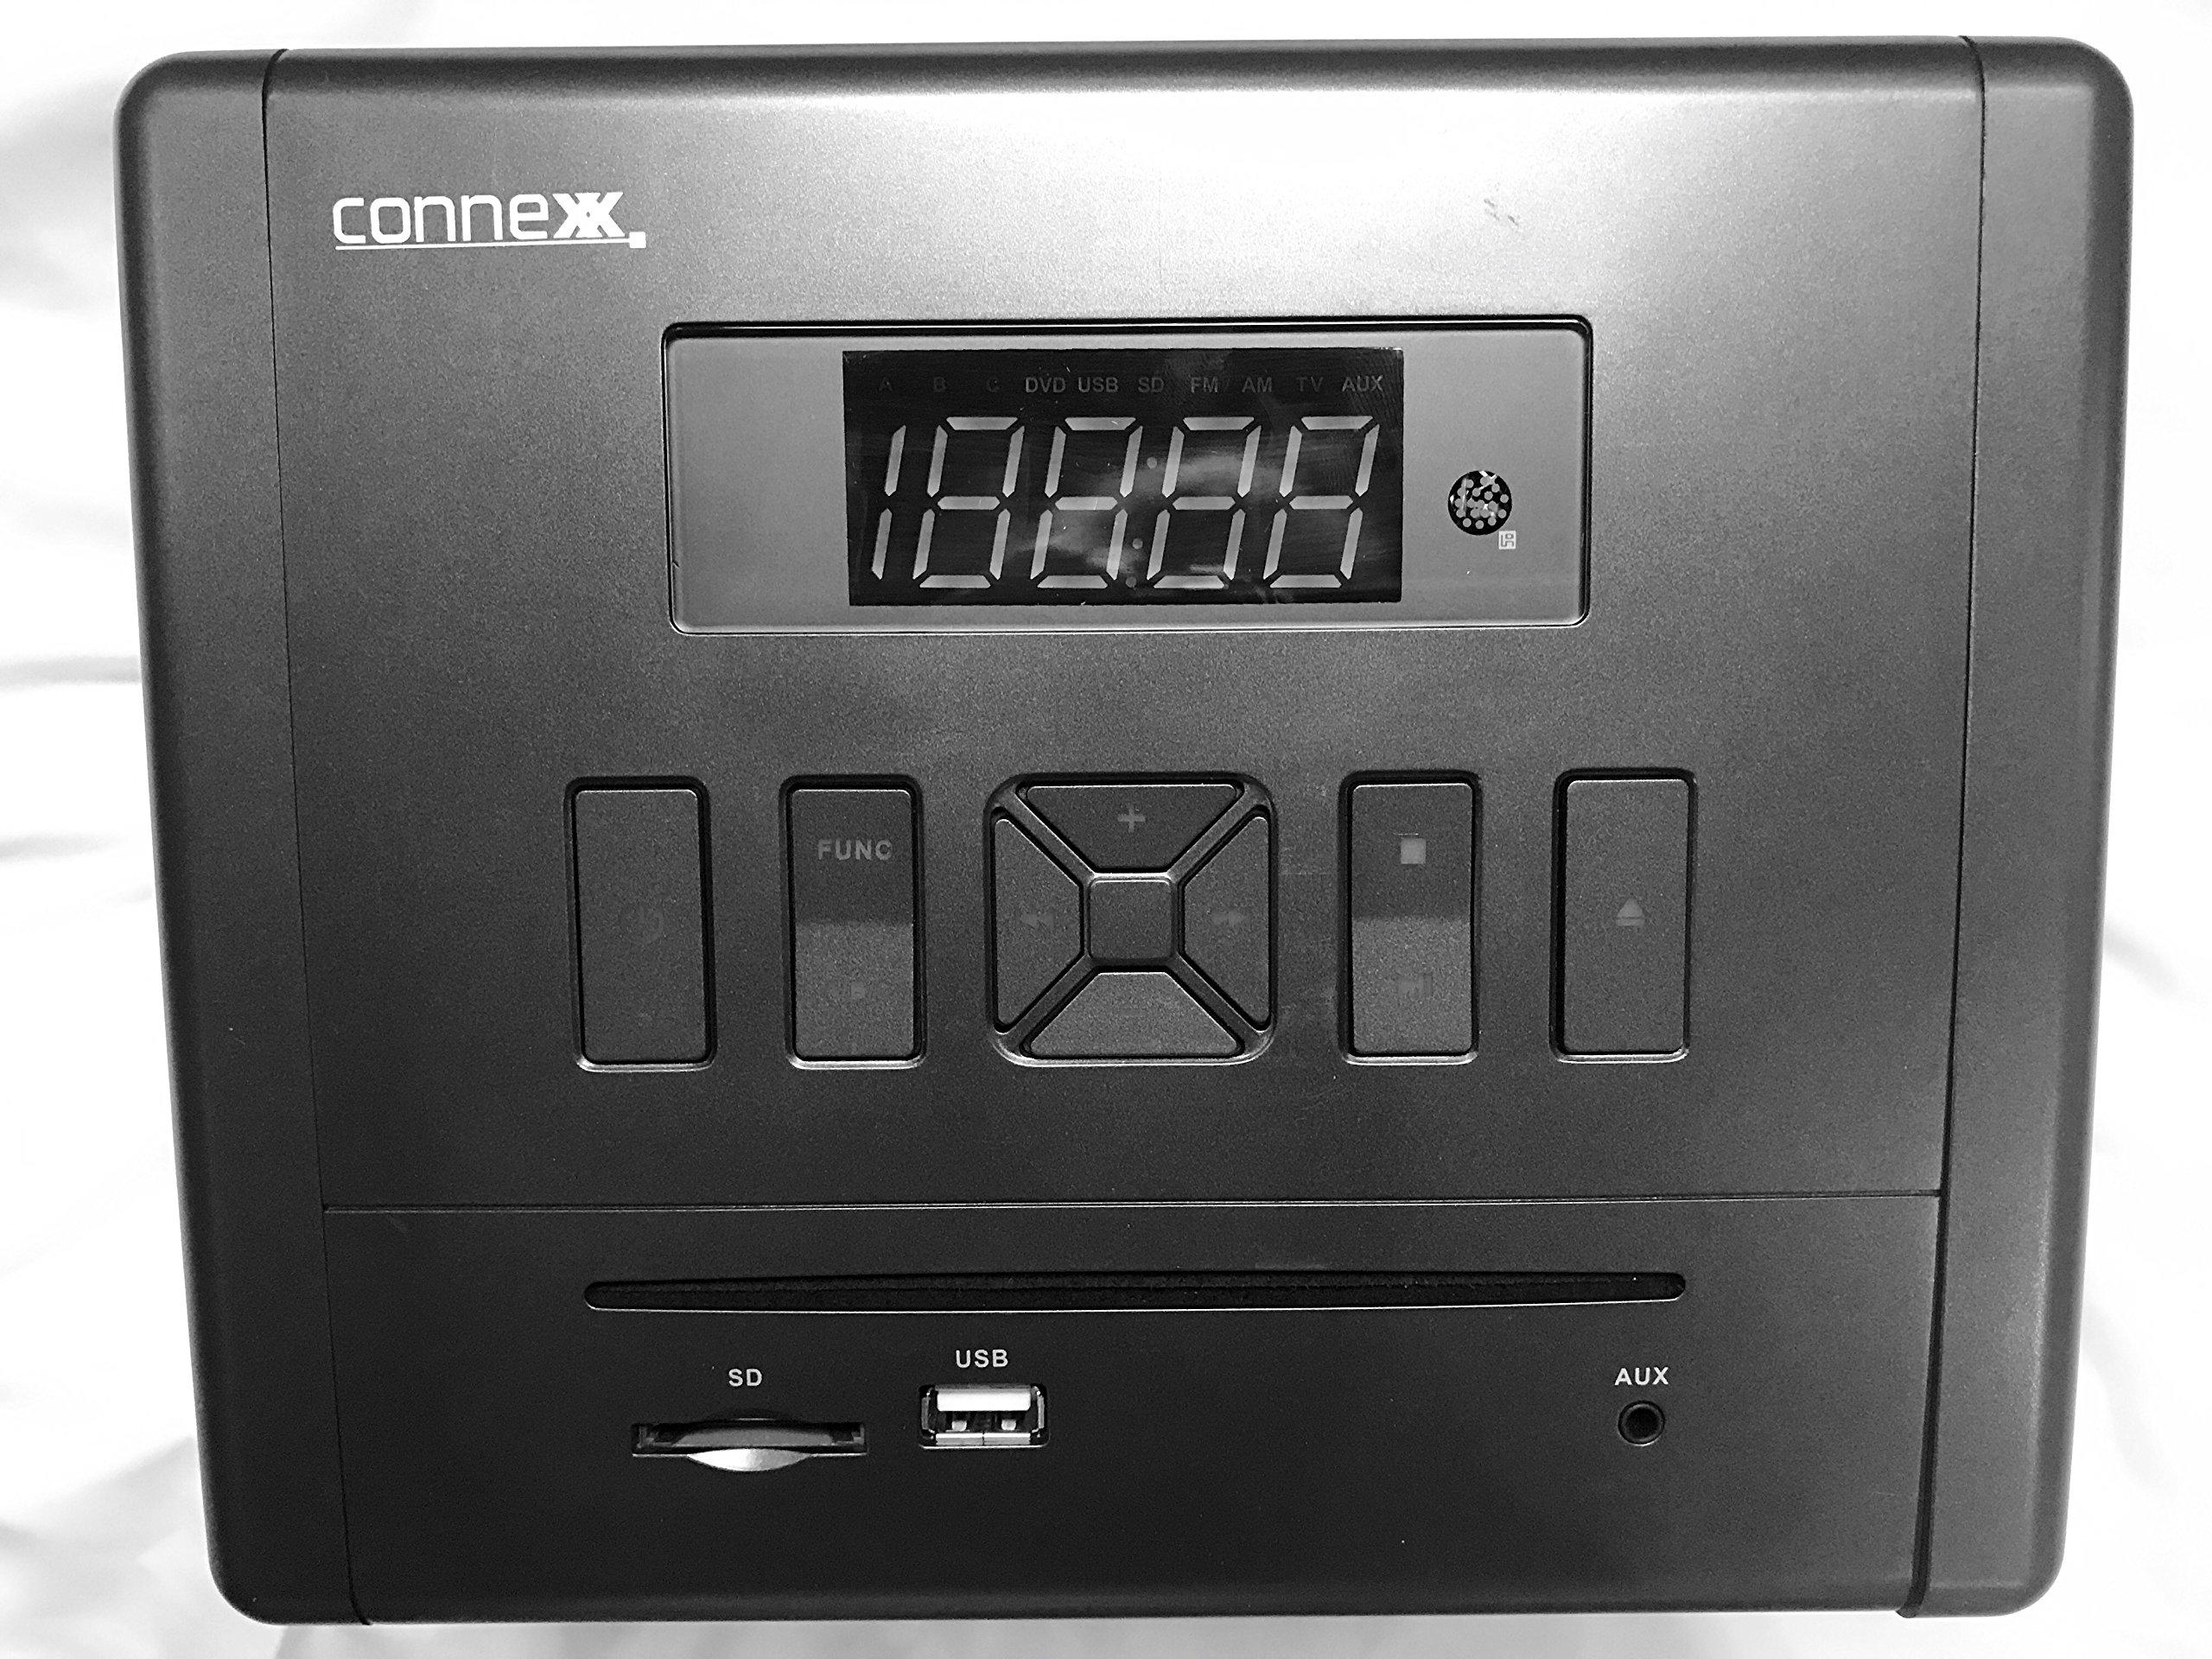 Connexx RP-3000BT HDMI/Bluetooth/DVD/CD/USB/AUX/AM/FM RV Radio